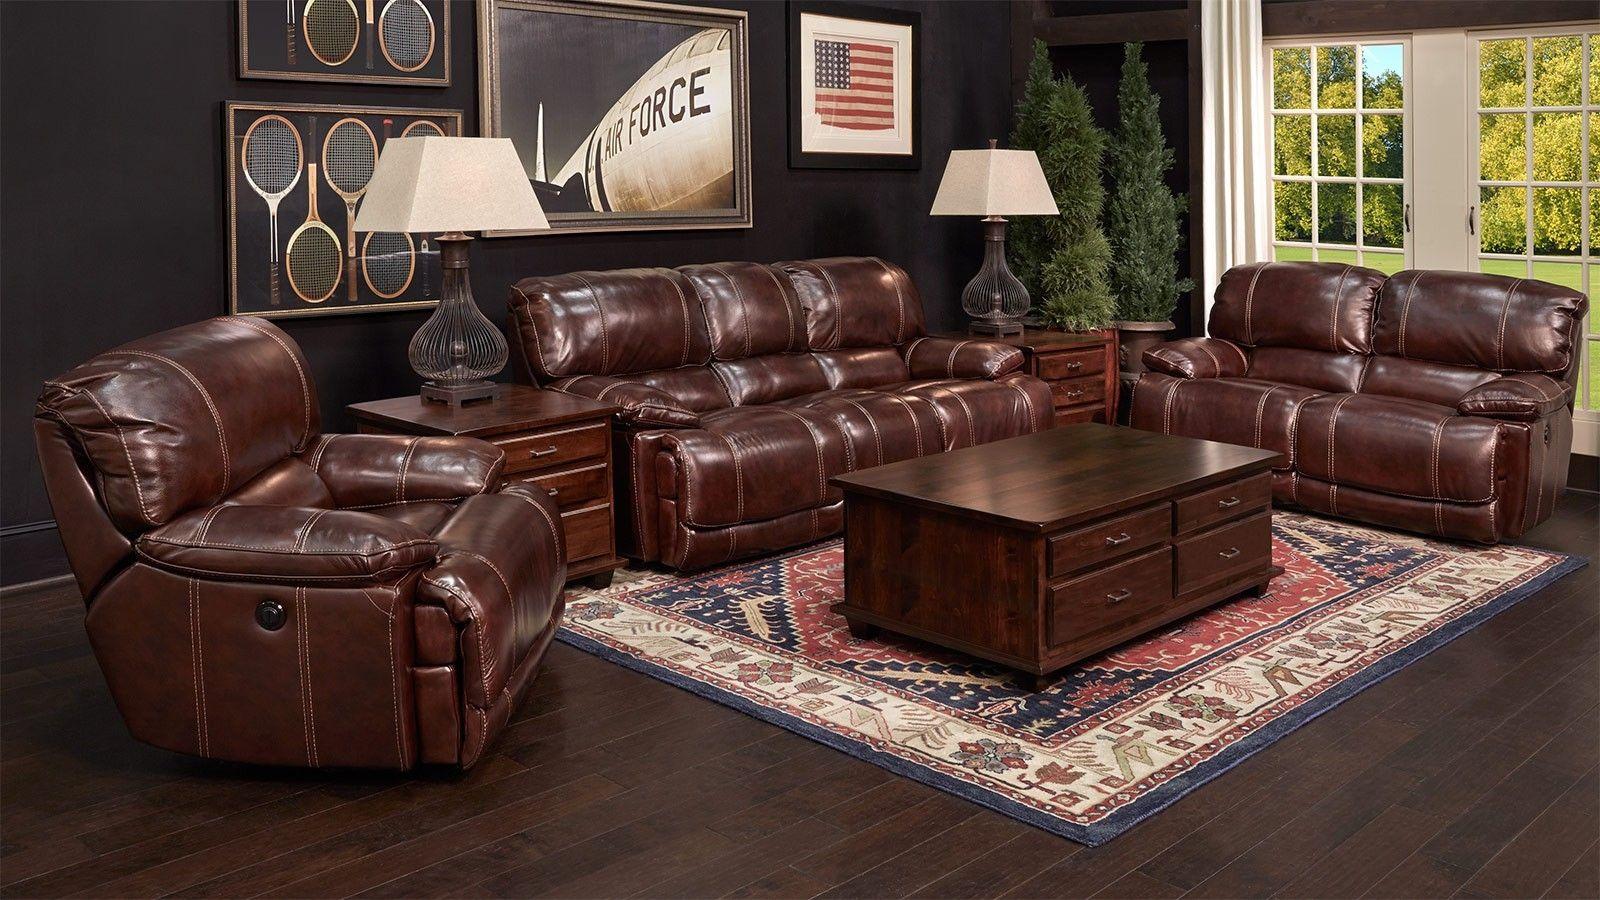 Flexsteel Furniture Gallery Furniture Store In Flexsteel Furniture Ratings 29947